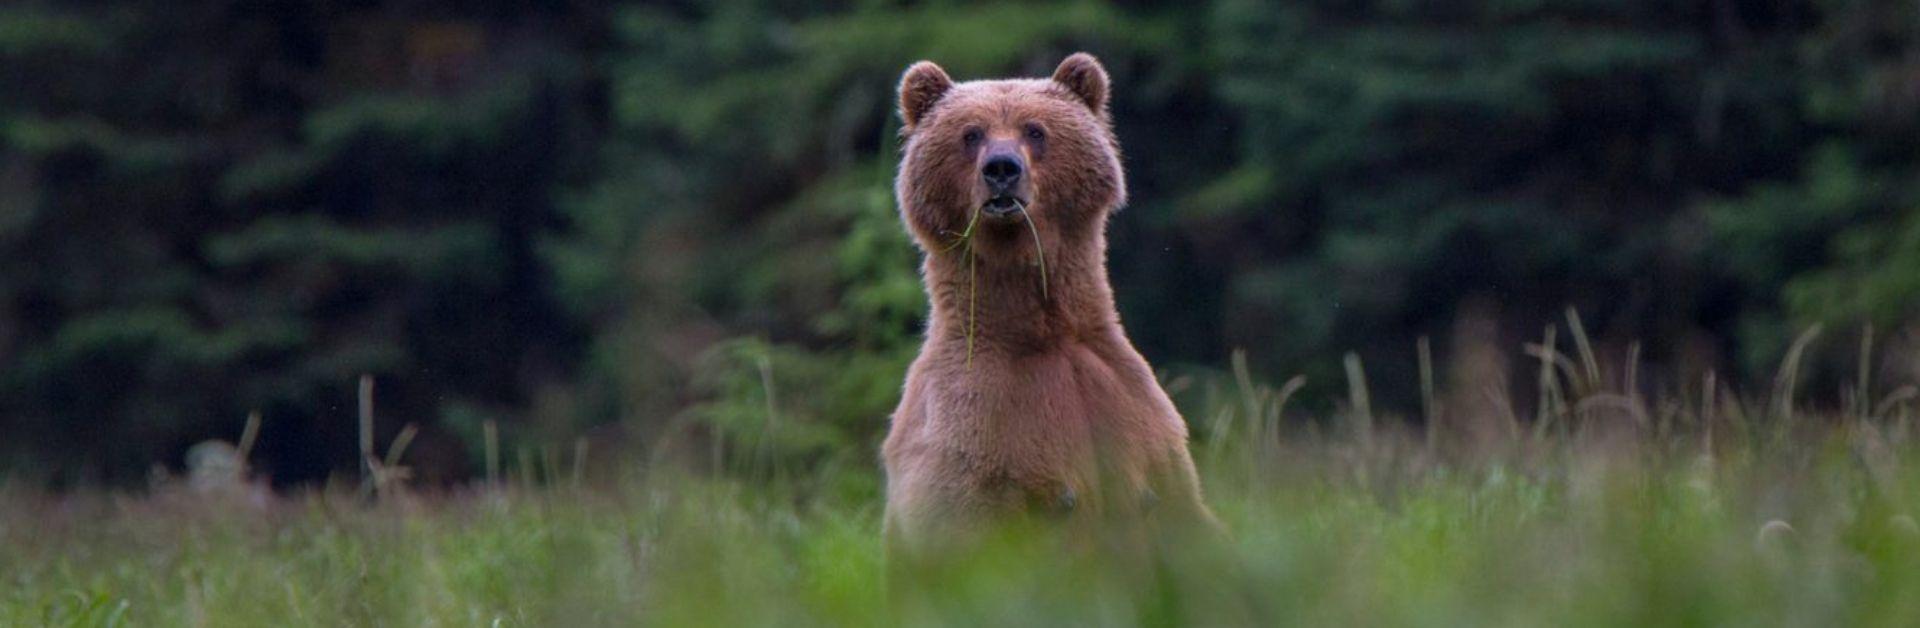 Alaska bear